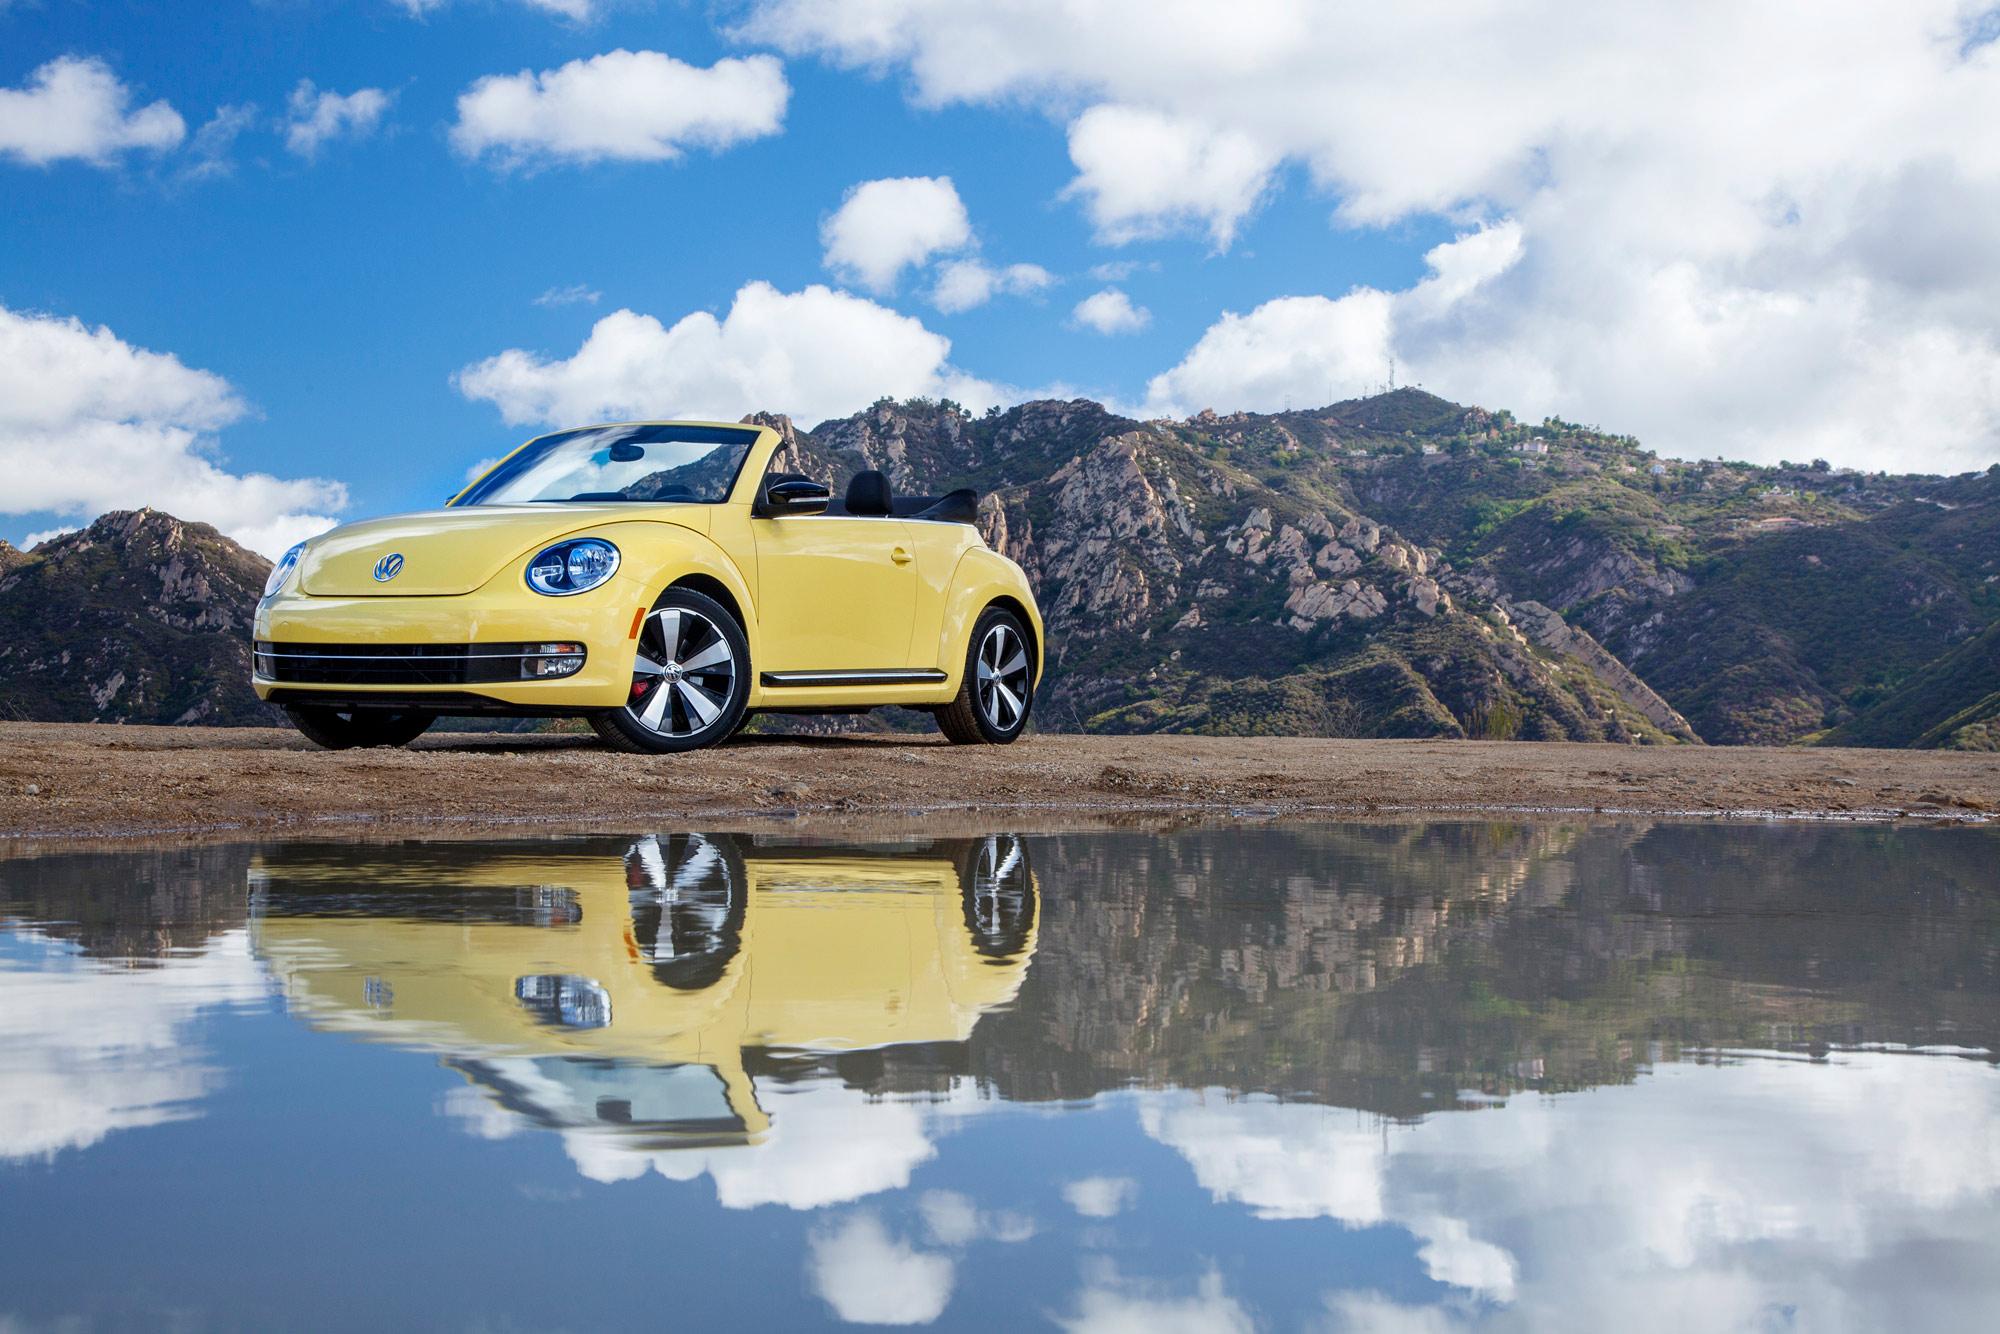 Audi Of America Announces New European Delivery Program Fourtitudecom - Audi european delivery